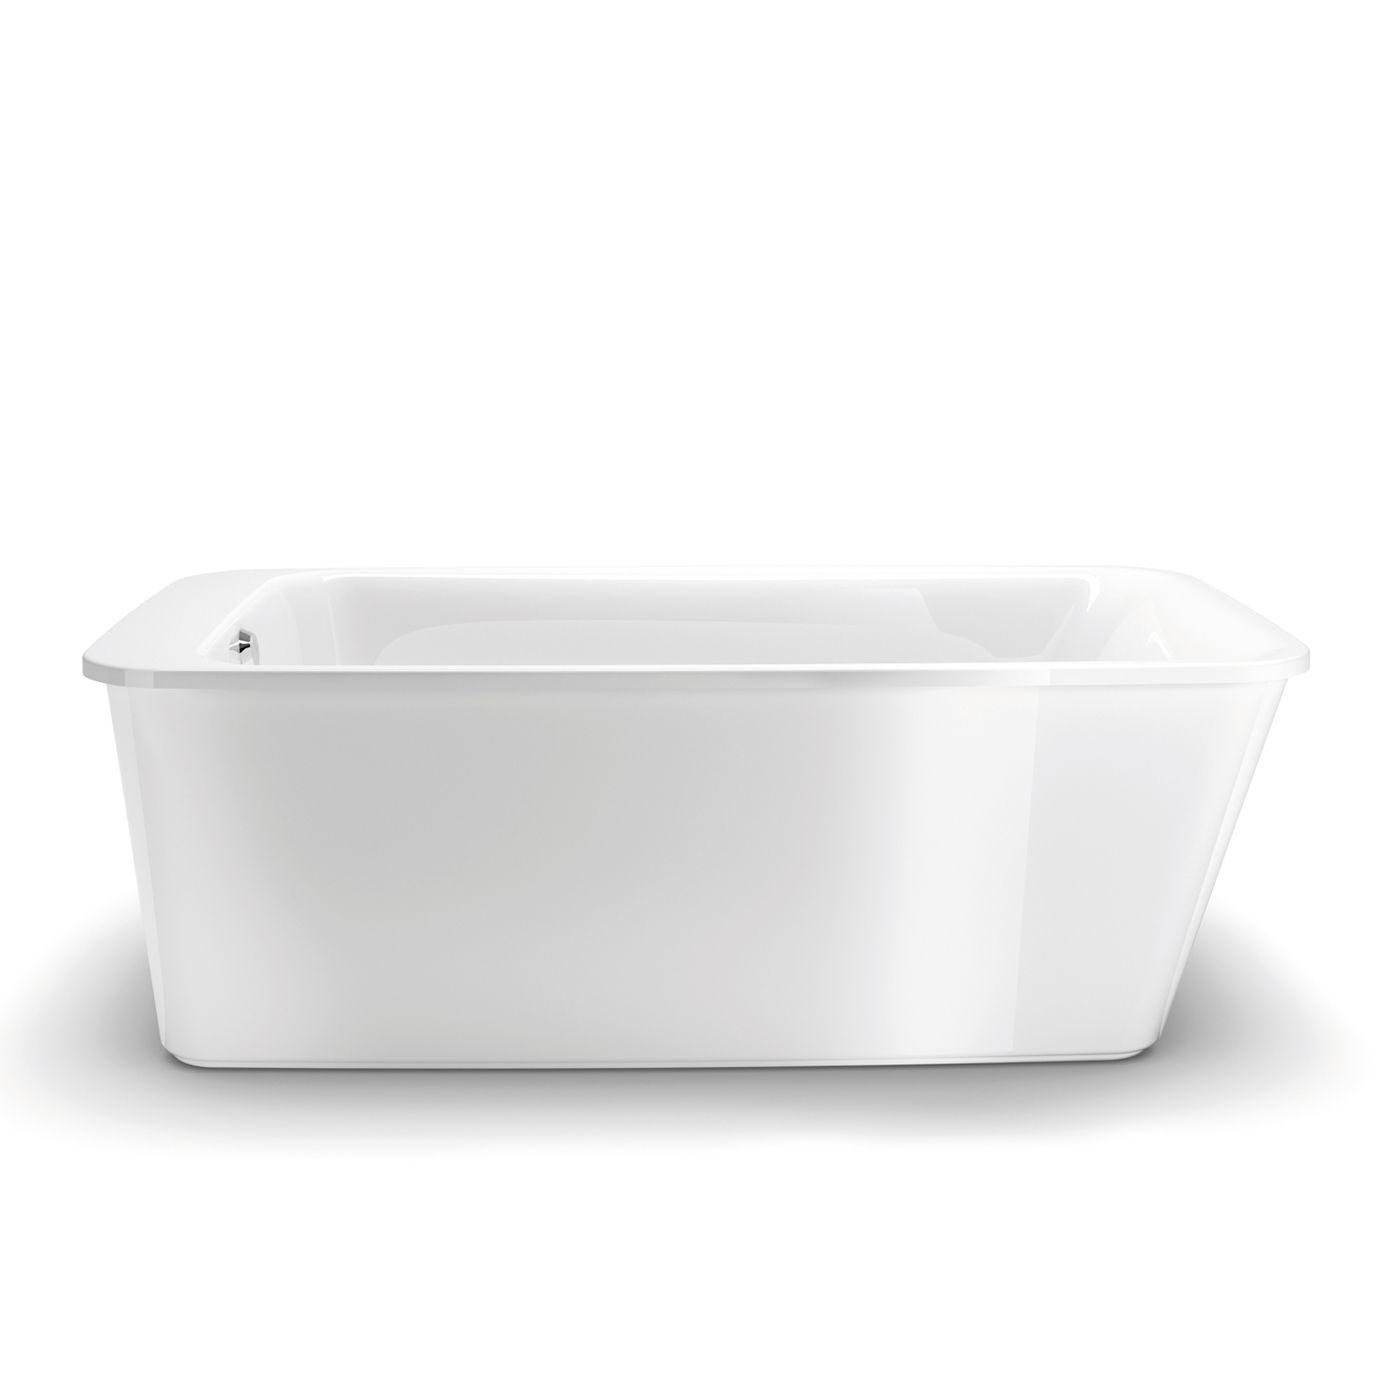 Shop Maax 105798-000-001-10 Lounge Freestanding Soaking Bathtub ...